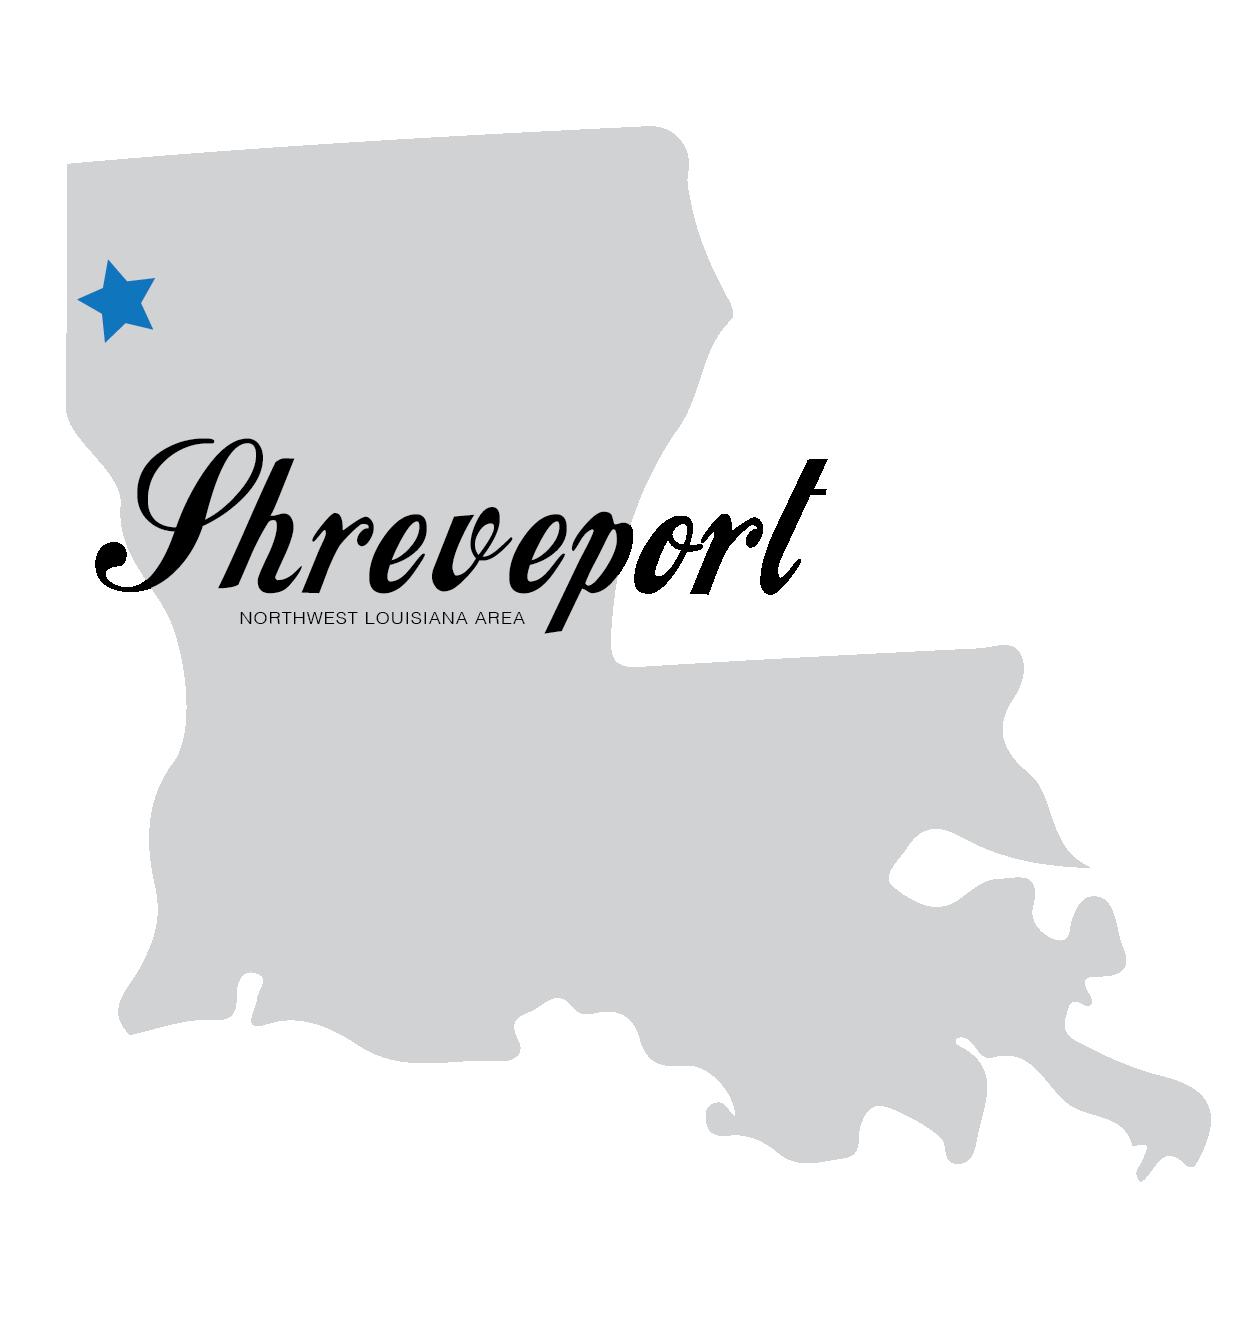 Northwest Louisiana Area - Campus Pastor, James Kirven5422 Mansfield Rd.Shreveport, LA. 71108